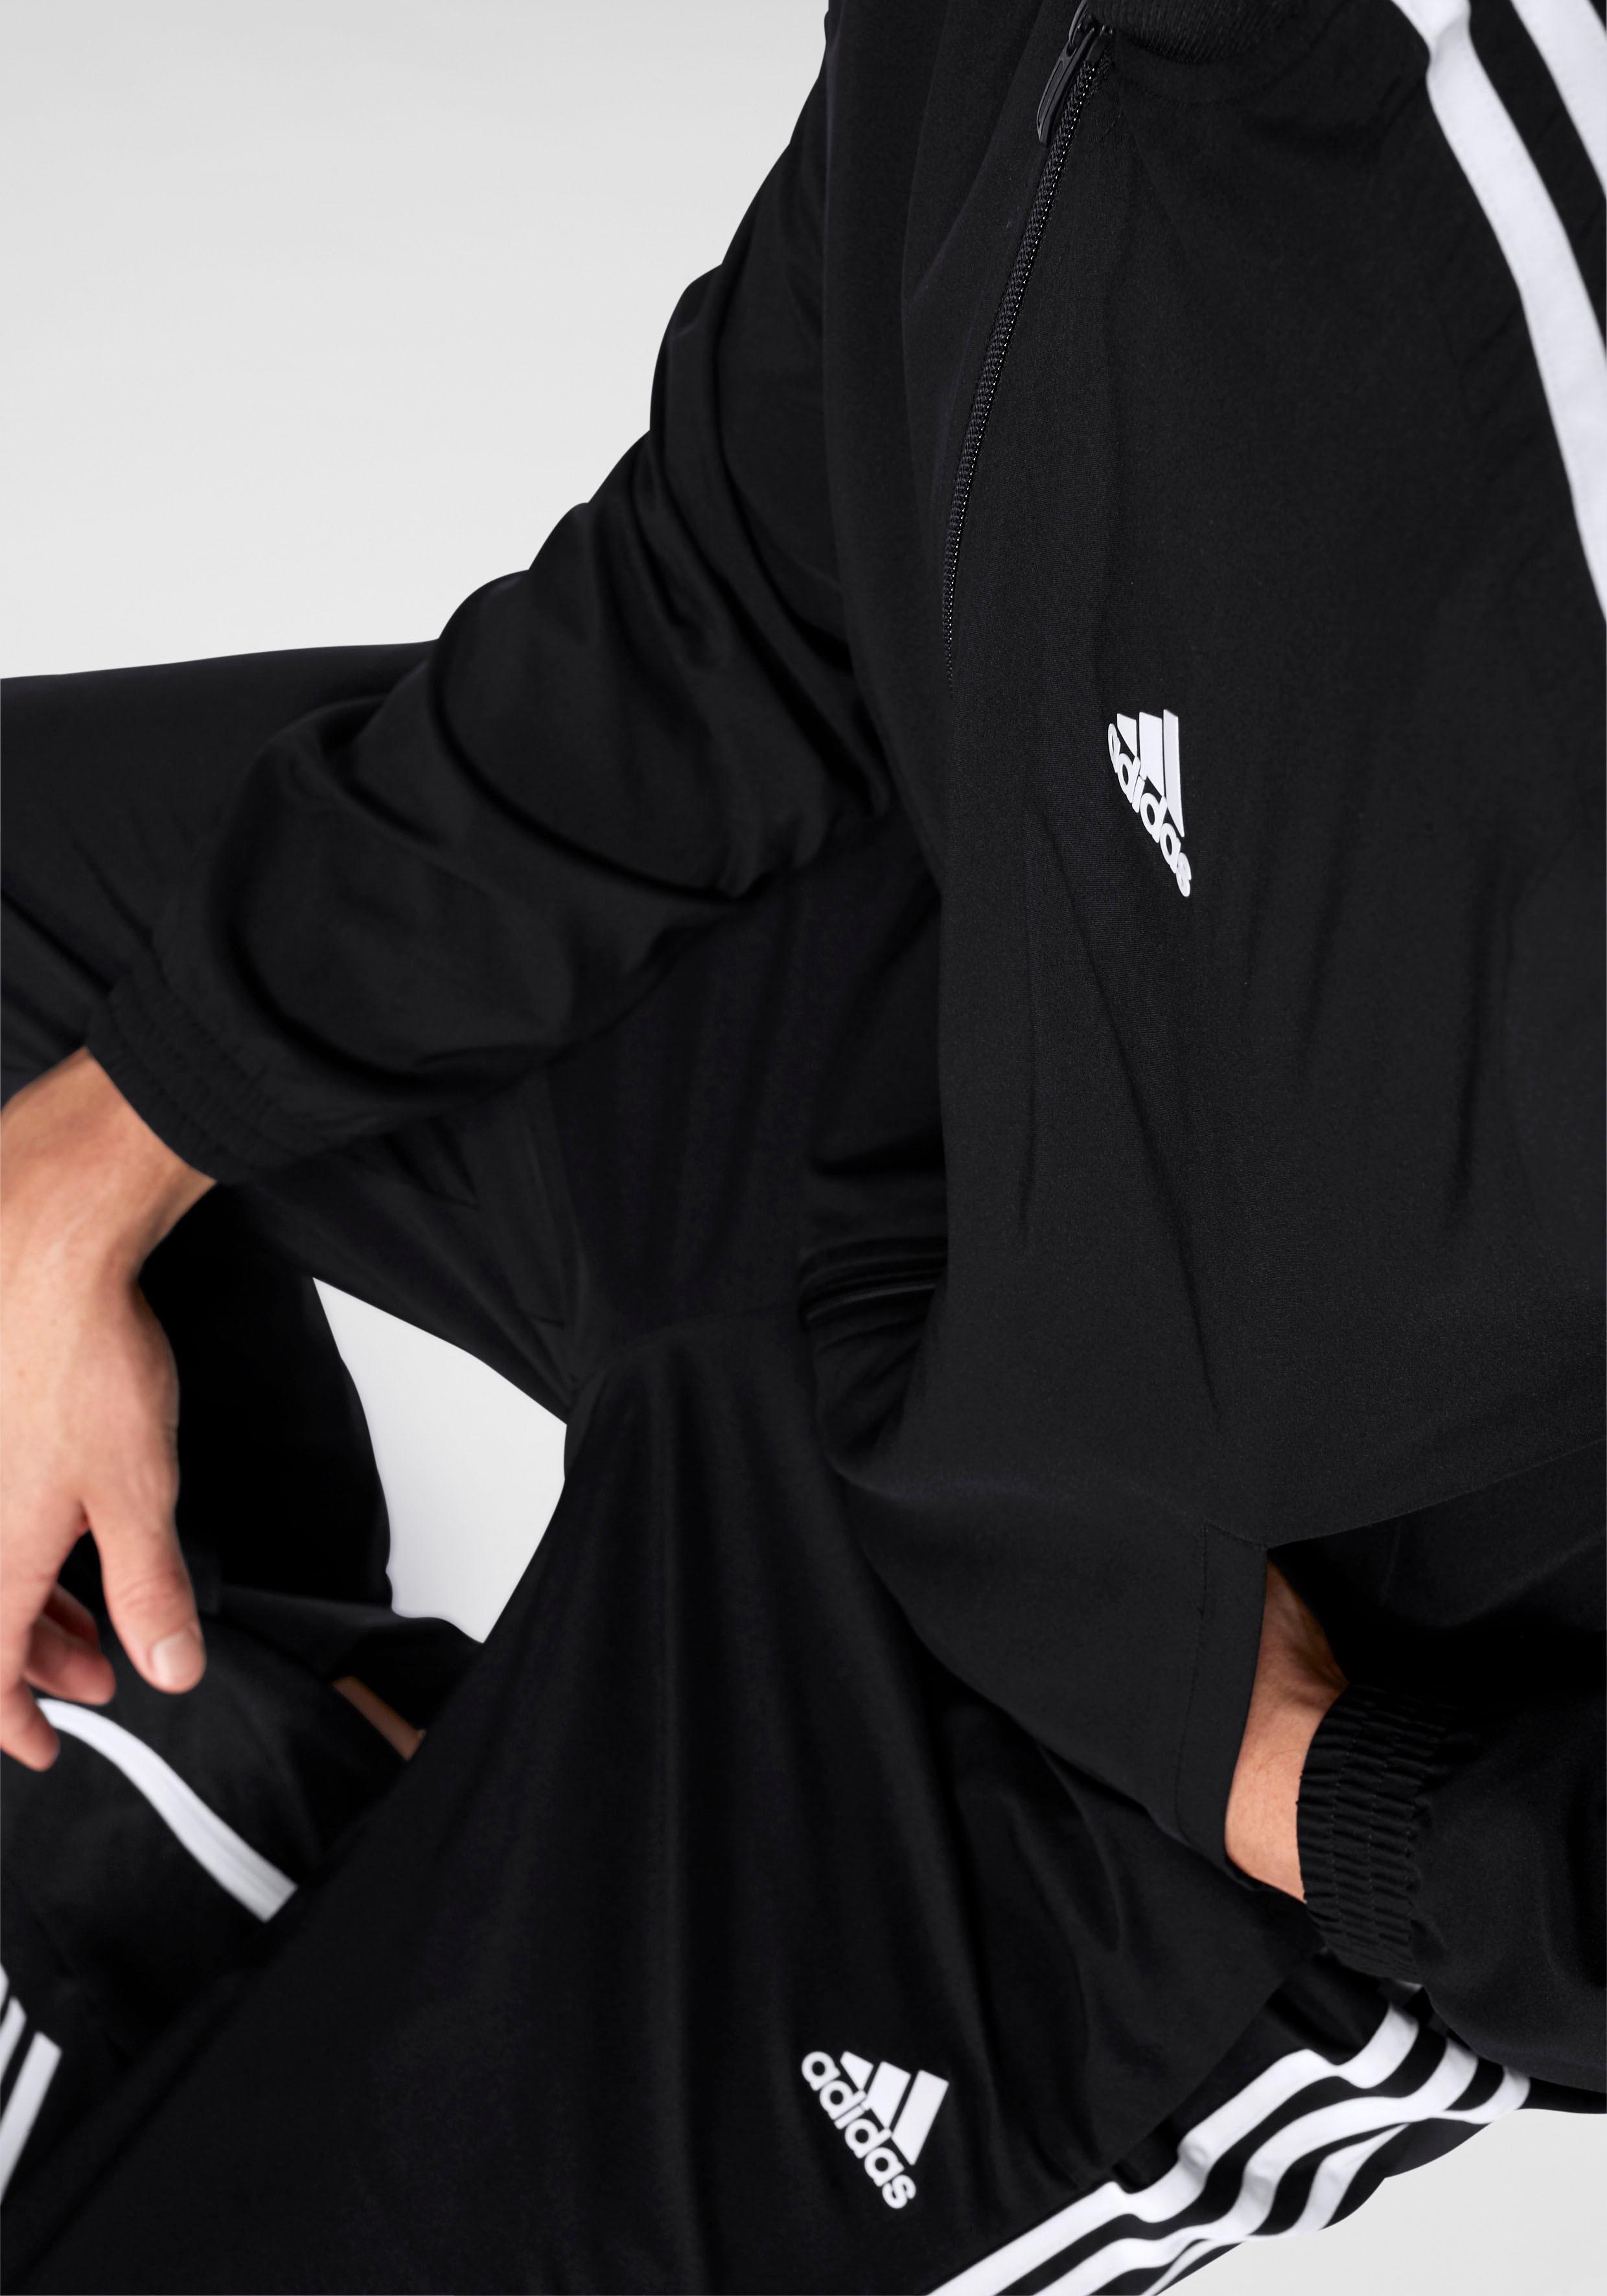 Adidas Woven Performance Sportpaktracksuit Light Online Shoppen GUpSqzMV